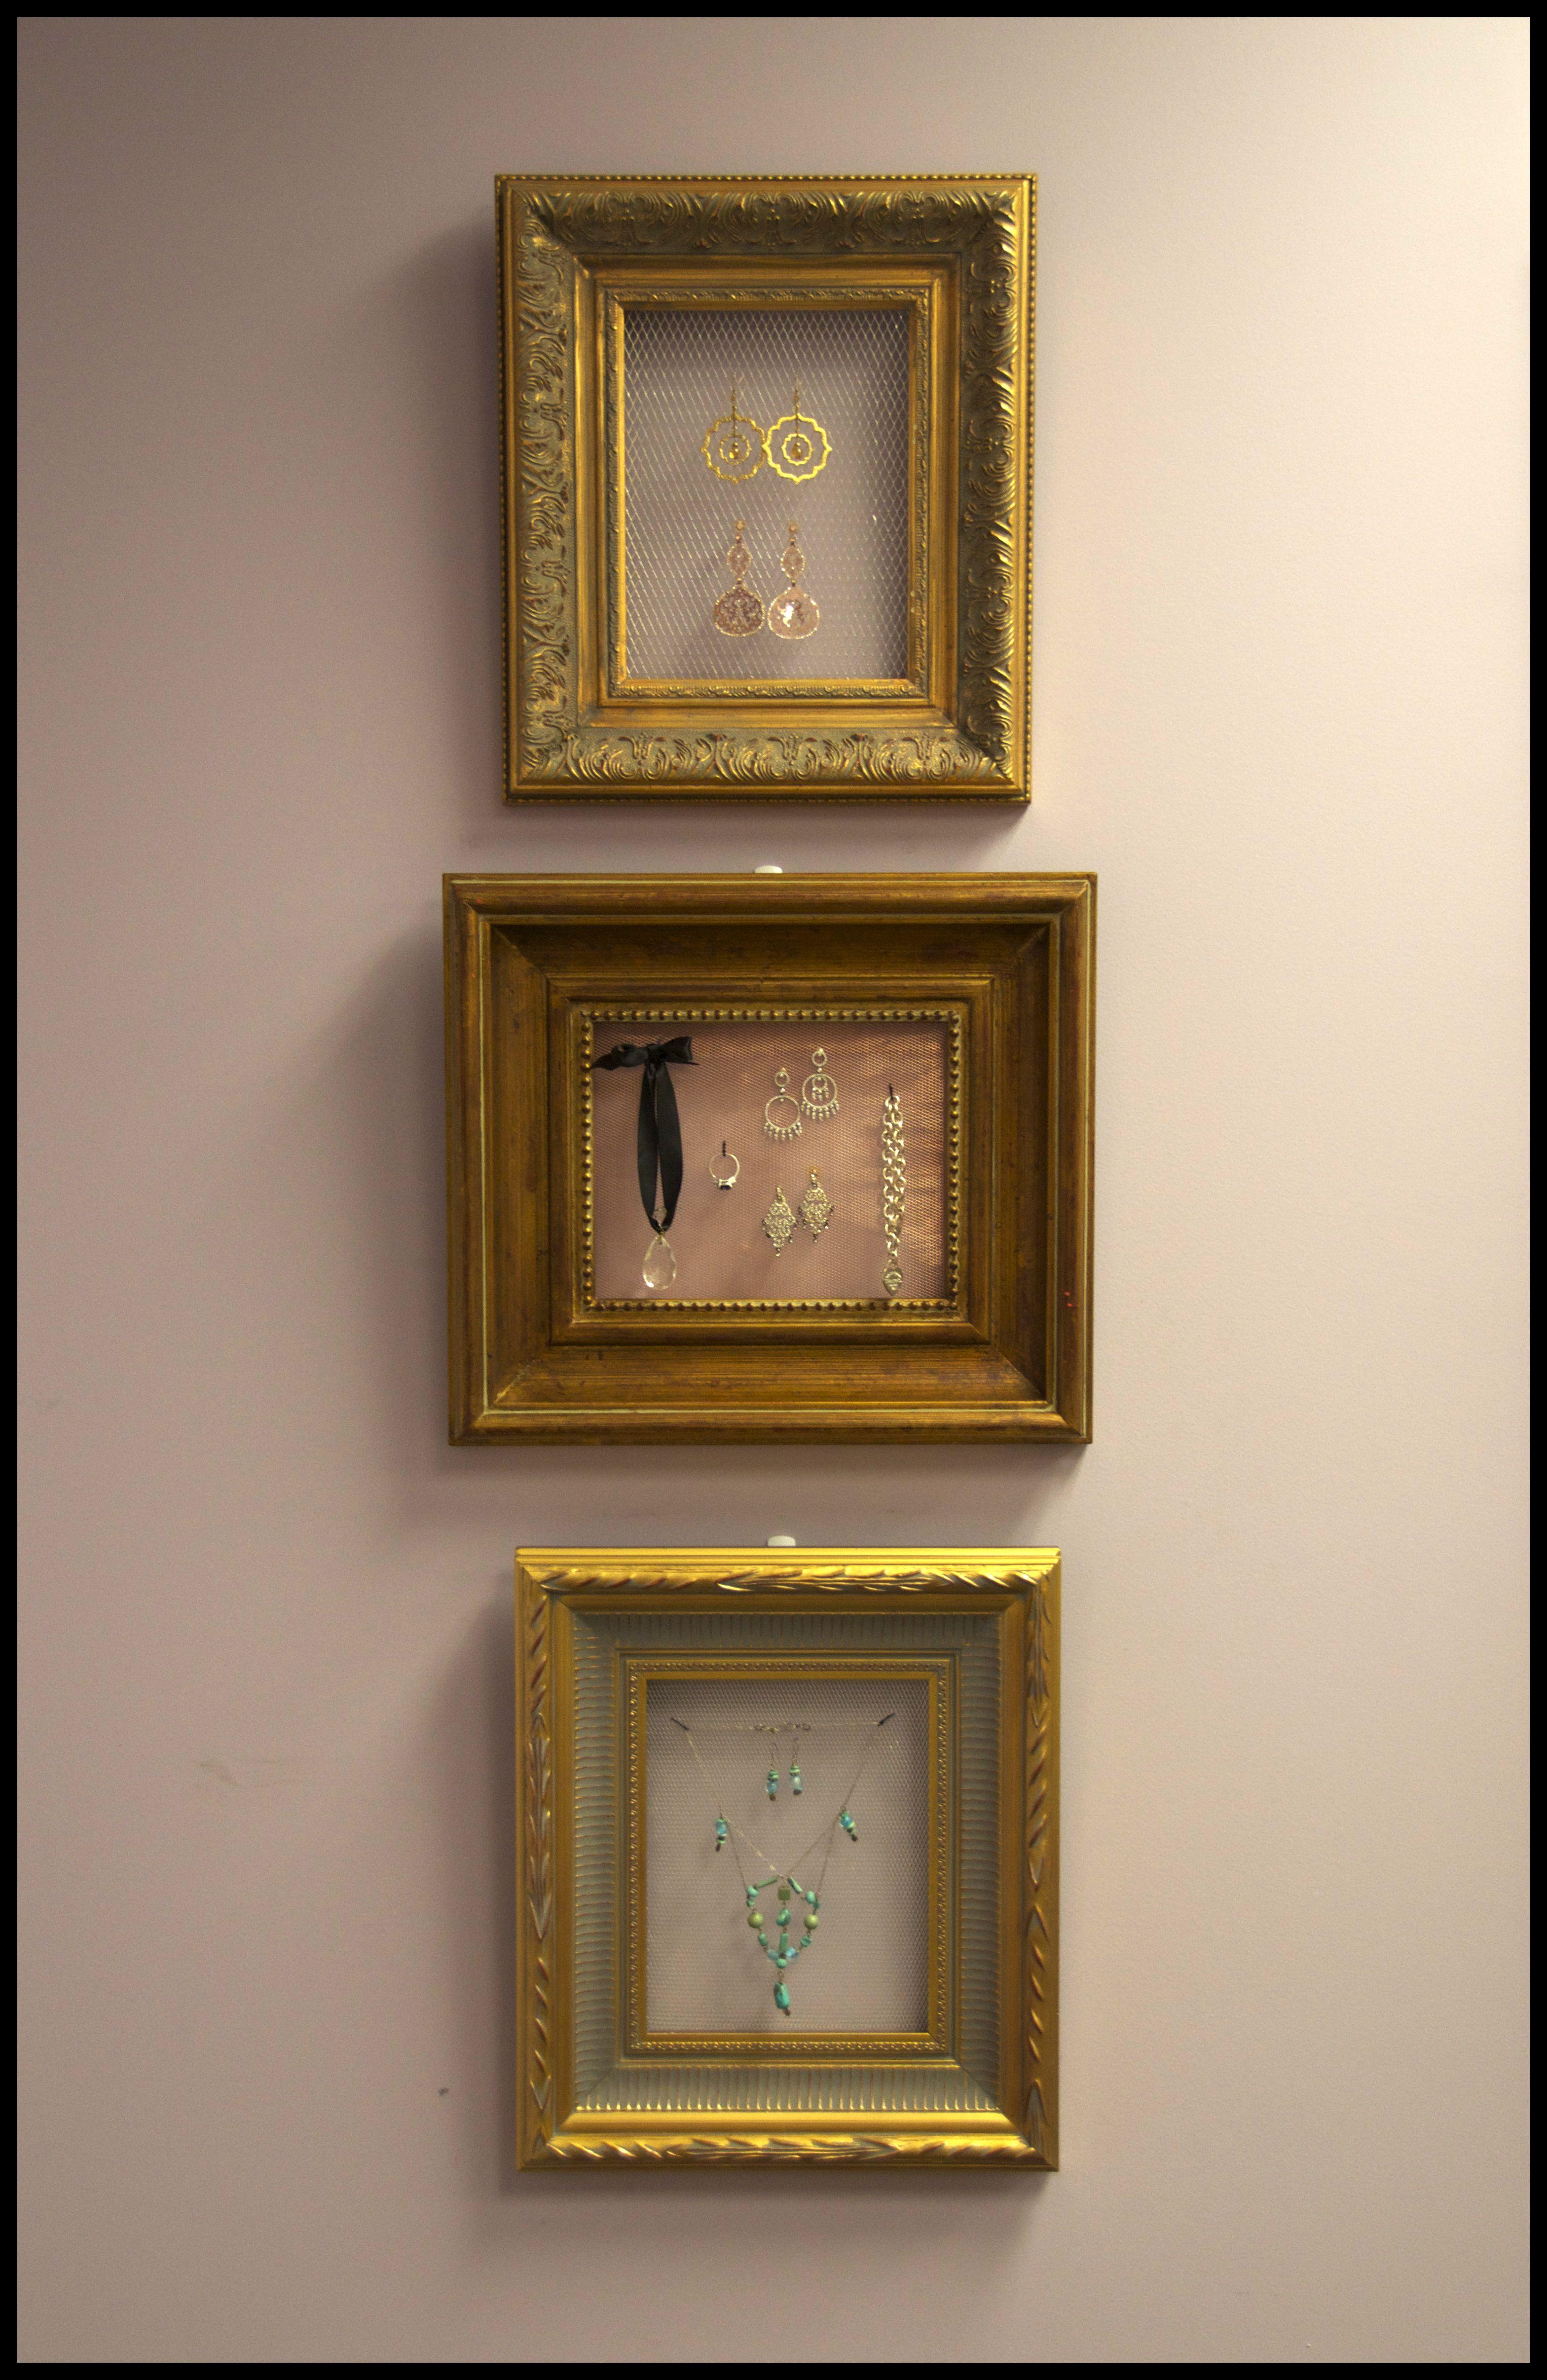 Custom Diy Jewelry Display Frames For Mom